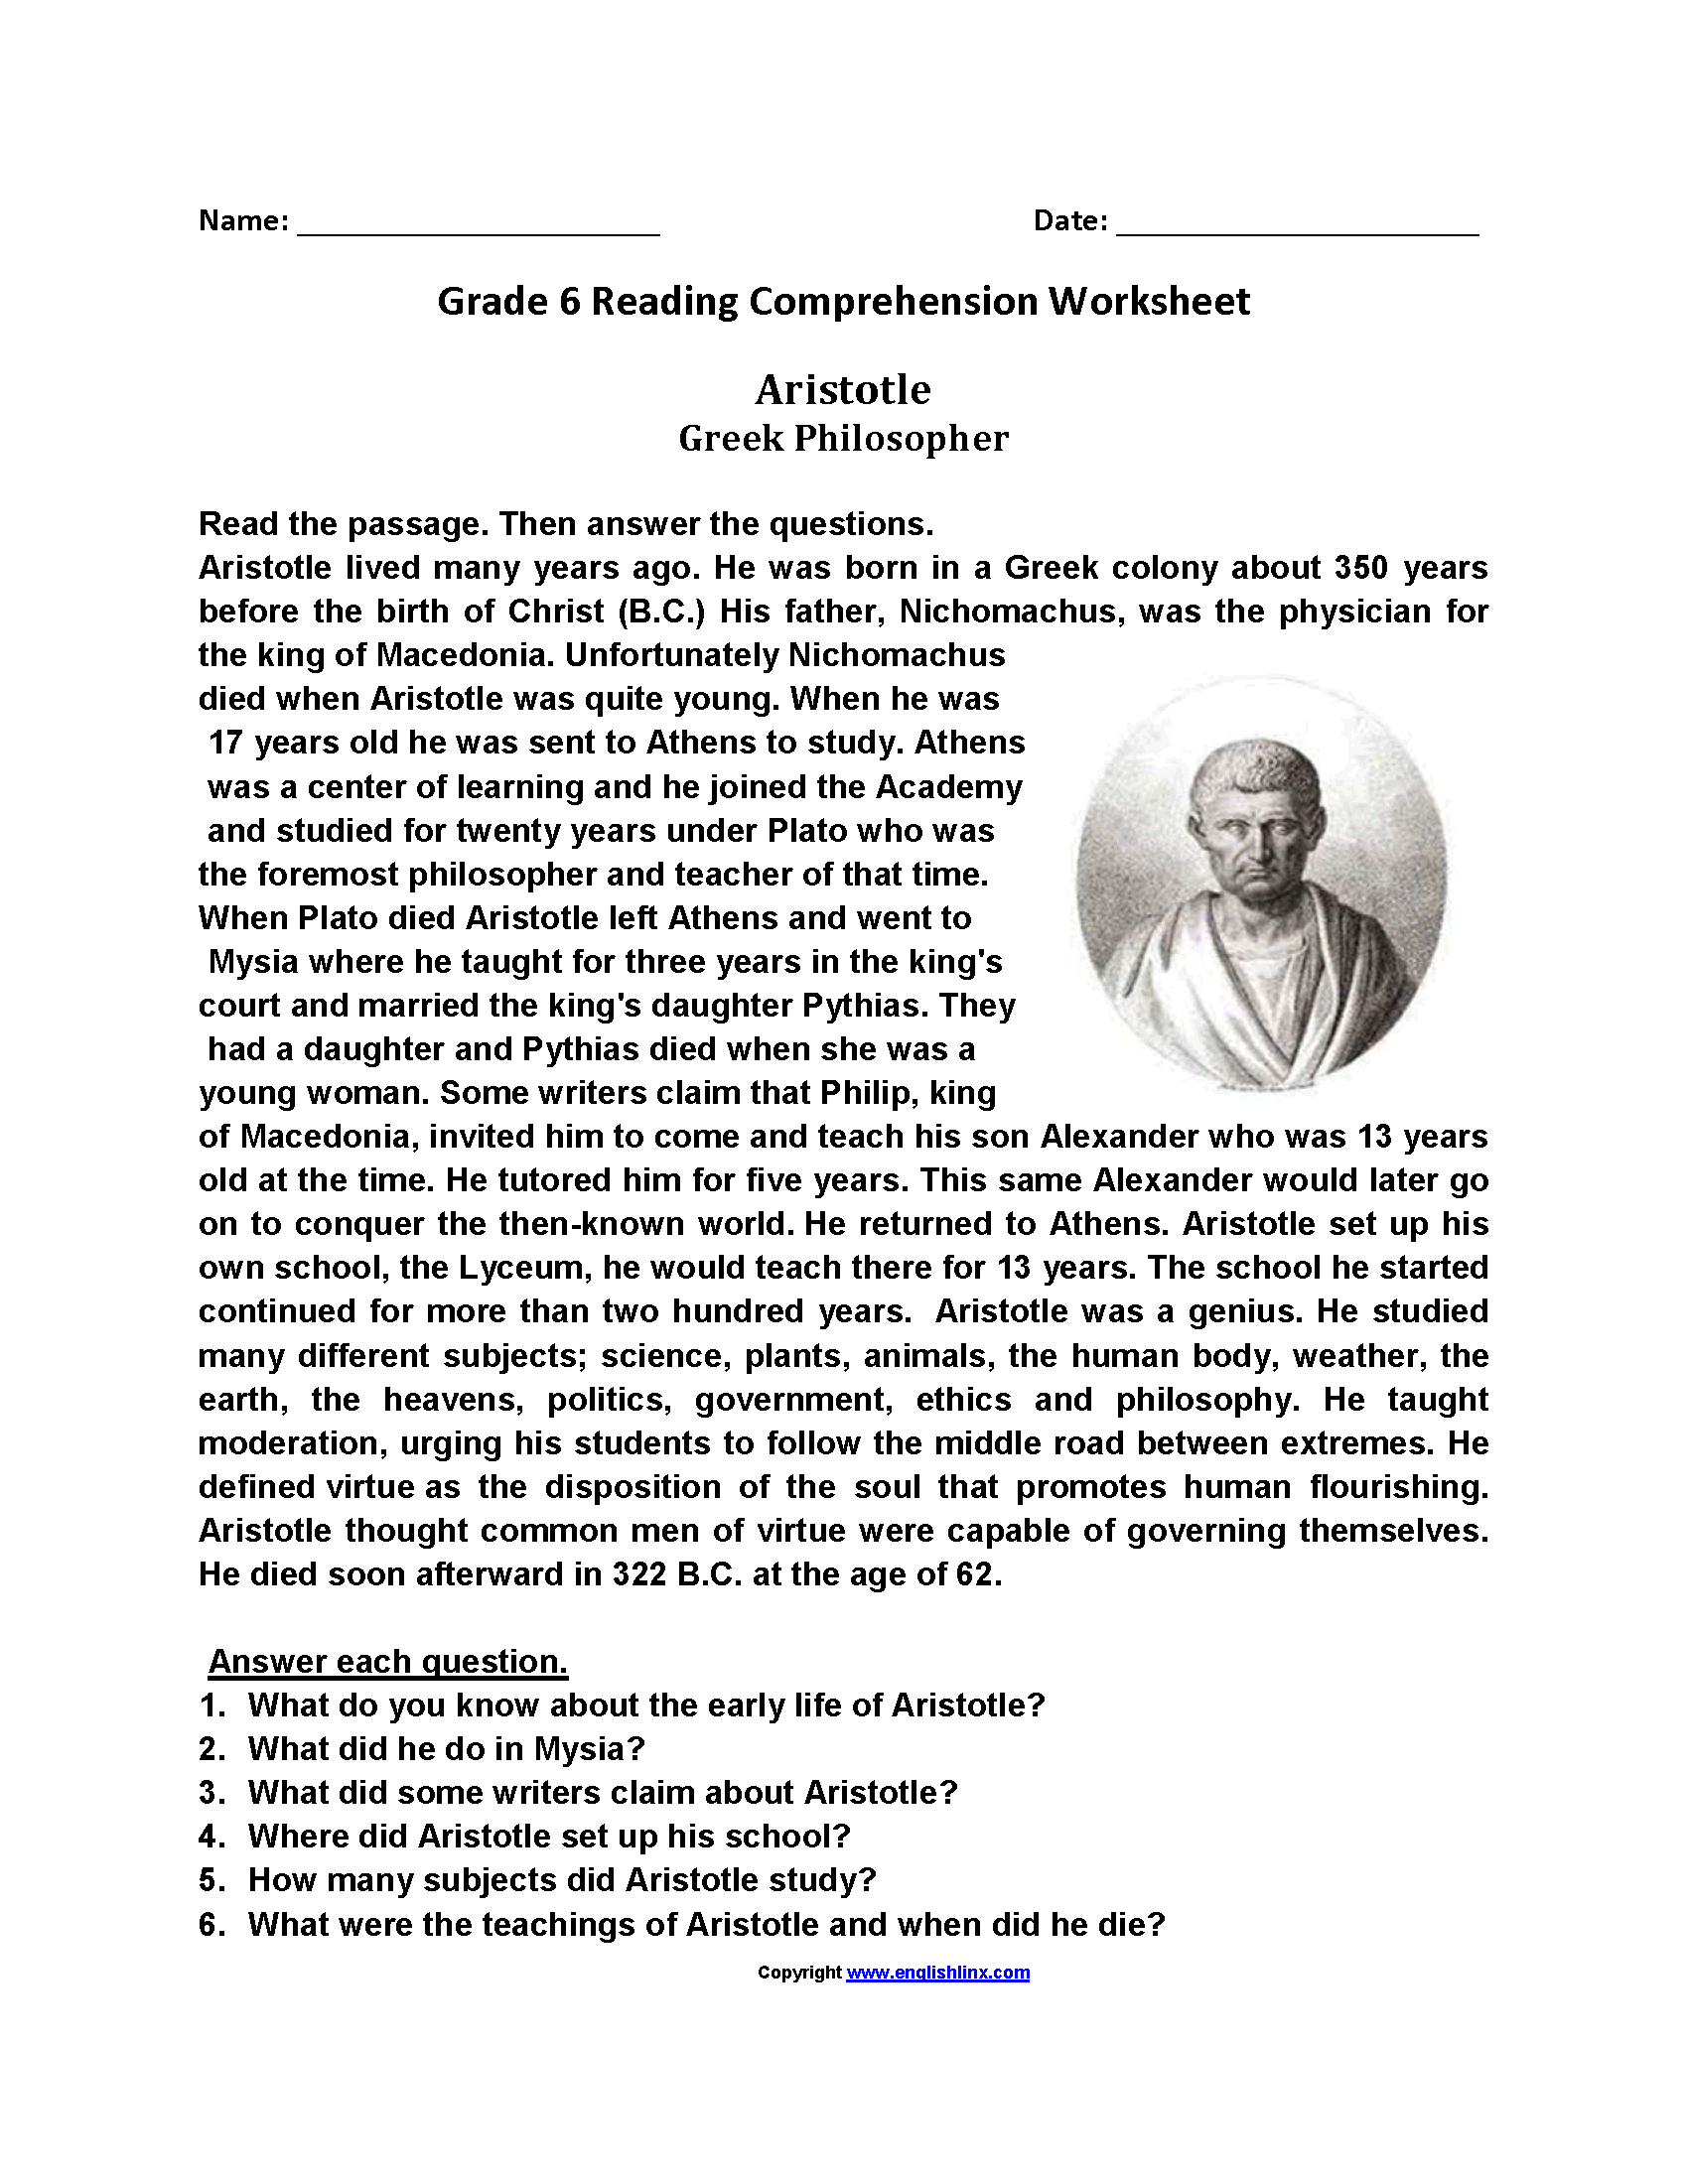 hight resolution of Reading comprehension passages grade 6 pdf   thaimacom   Reading  comprehension worksheets